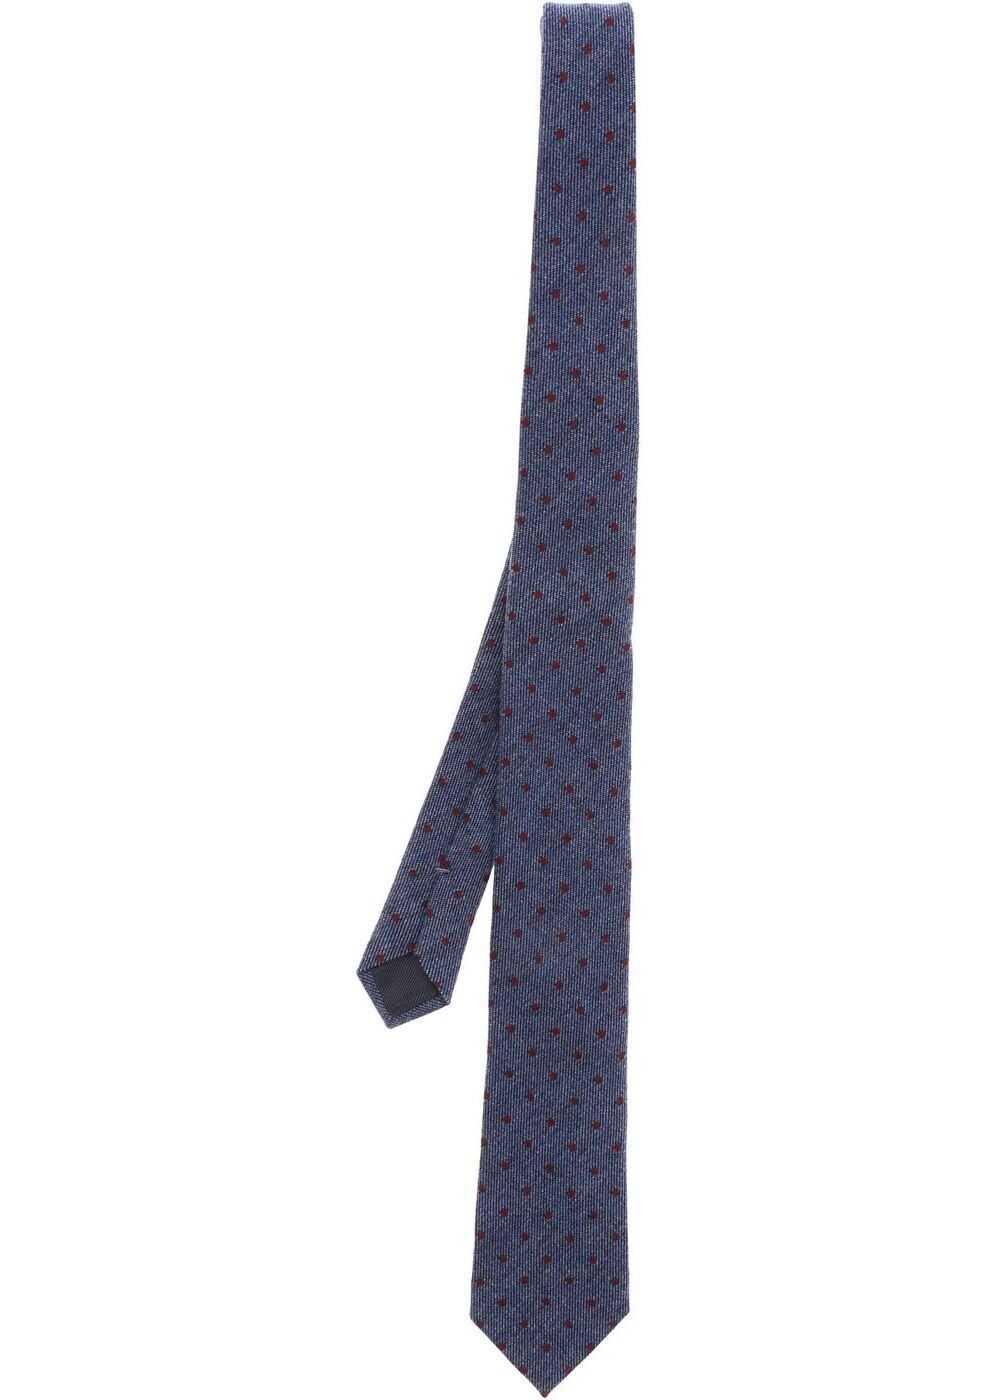 Ermenegildo Zegna Melange Blue Tie With Polka Dots Blue